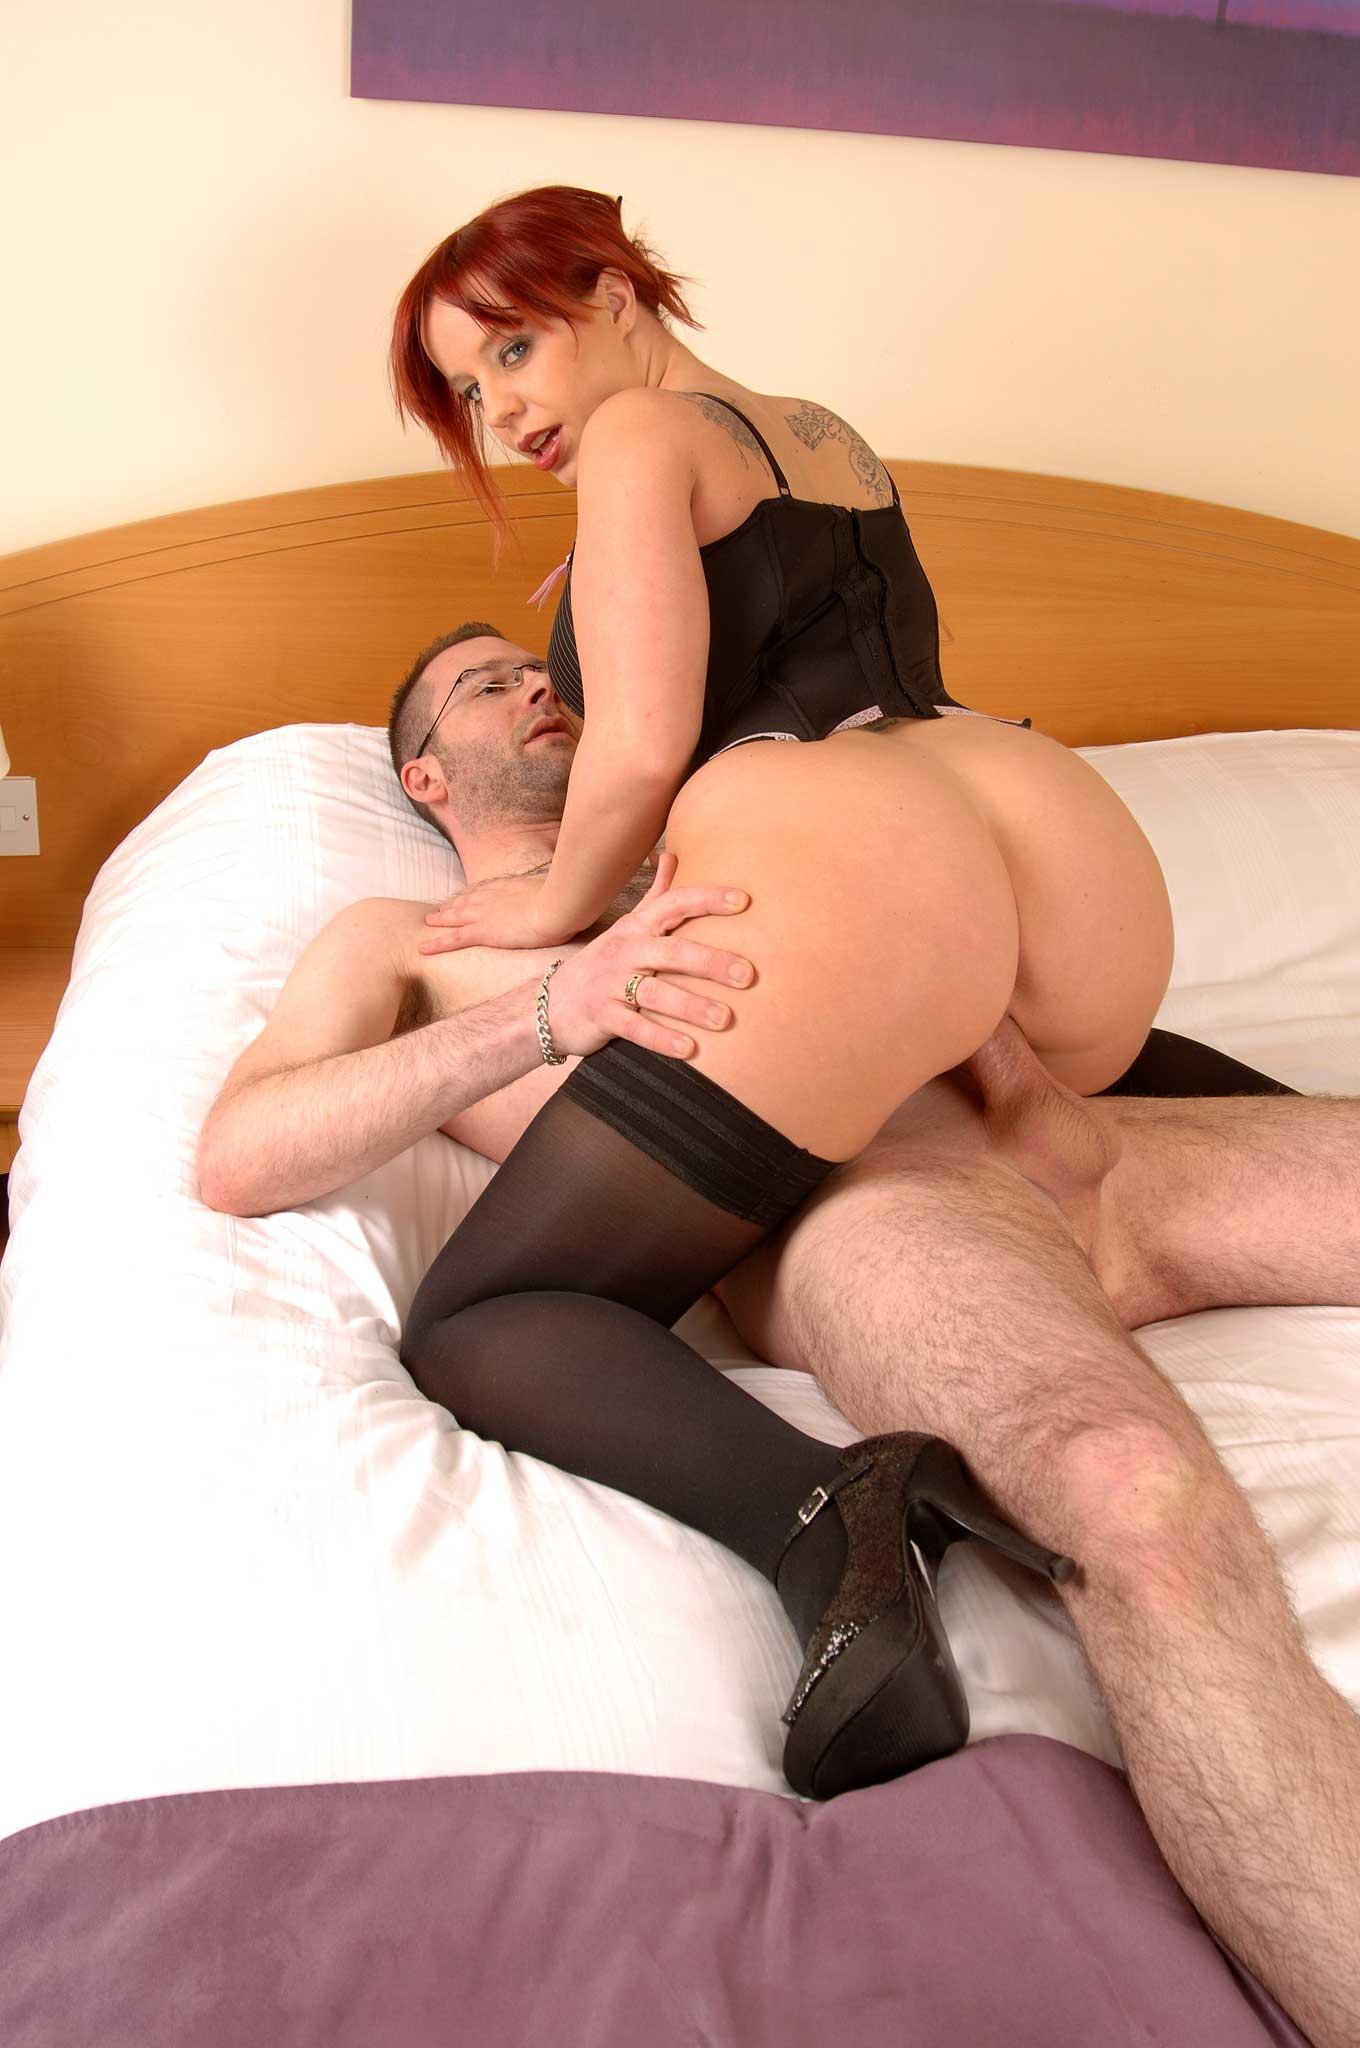 Mature stockings and mom porn pics